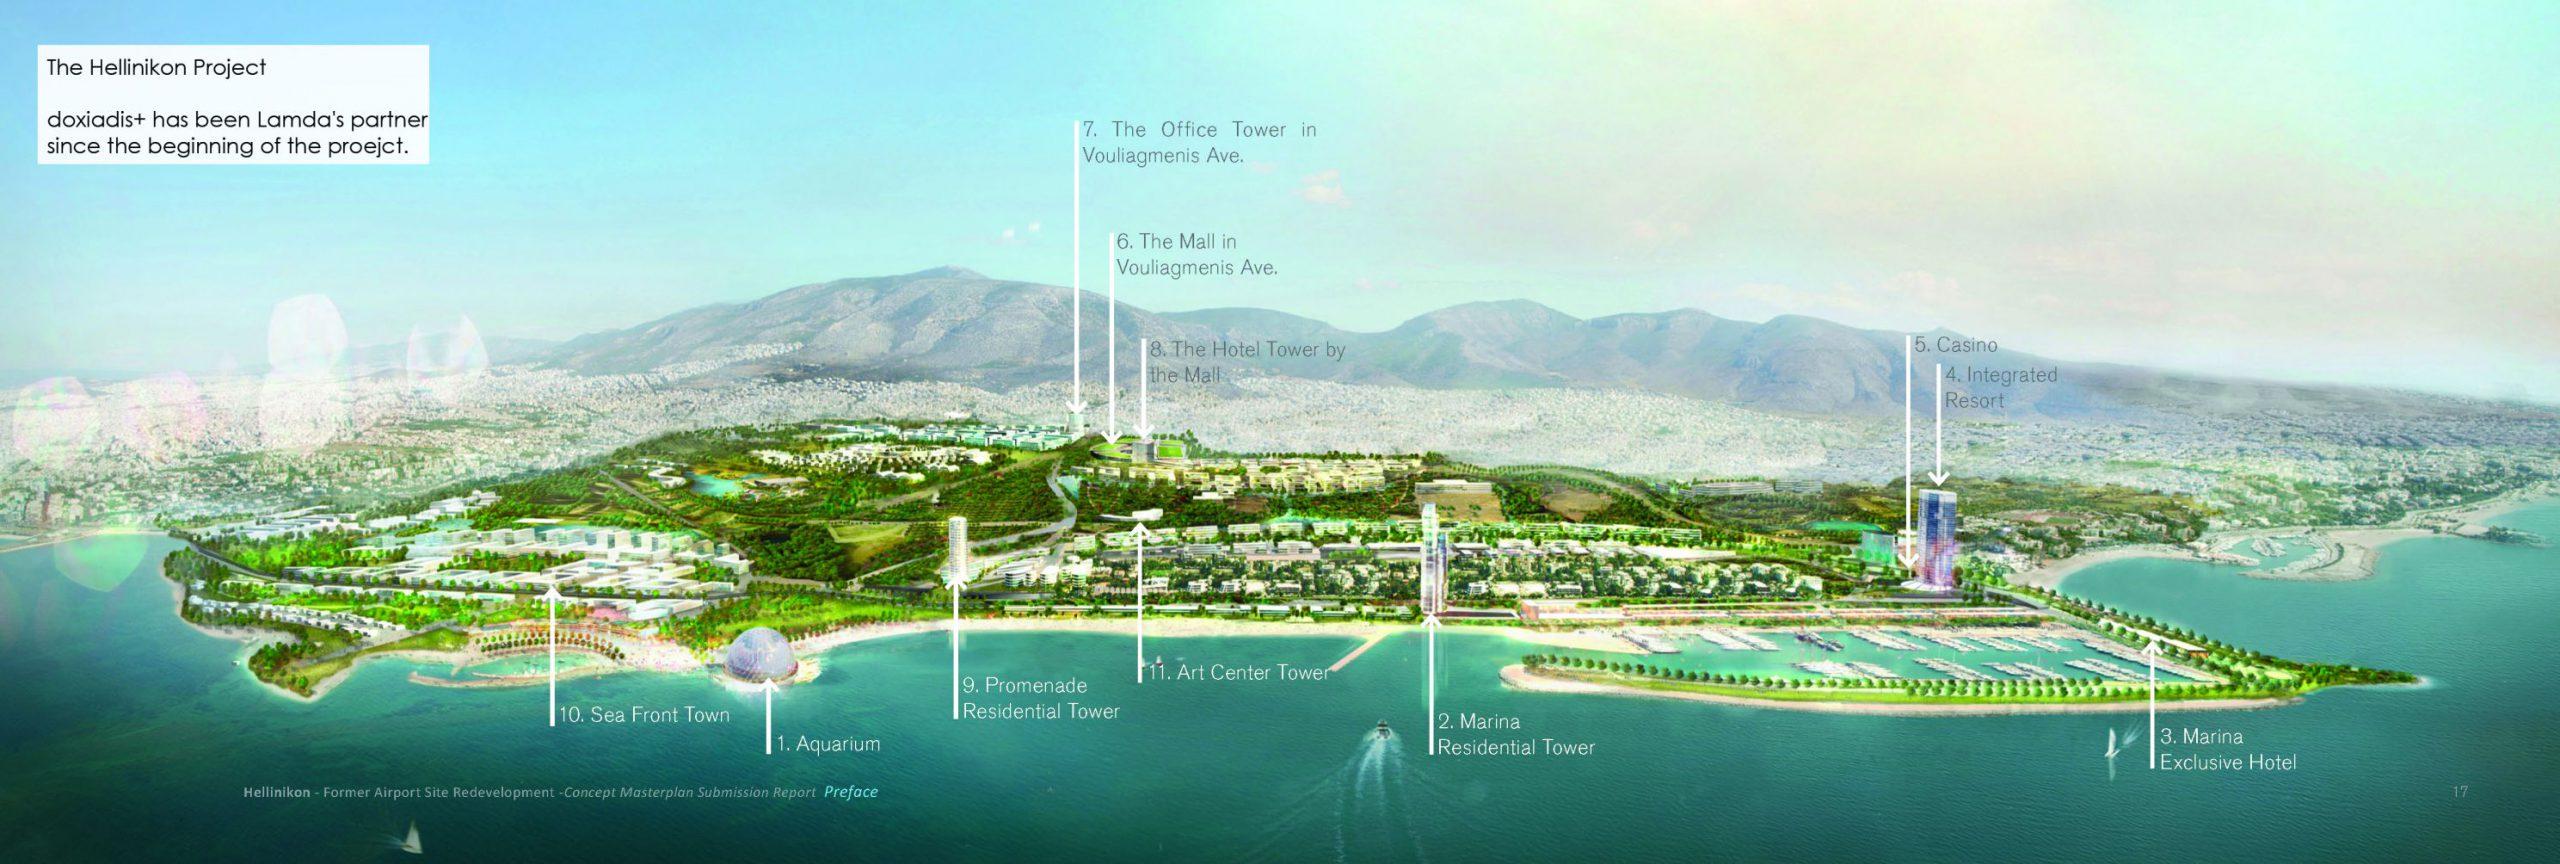 Metropolitan_Site_of_Hellinikon_Concept_Masterplan_Report_I 173